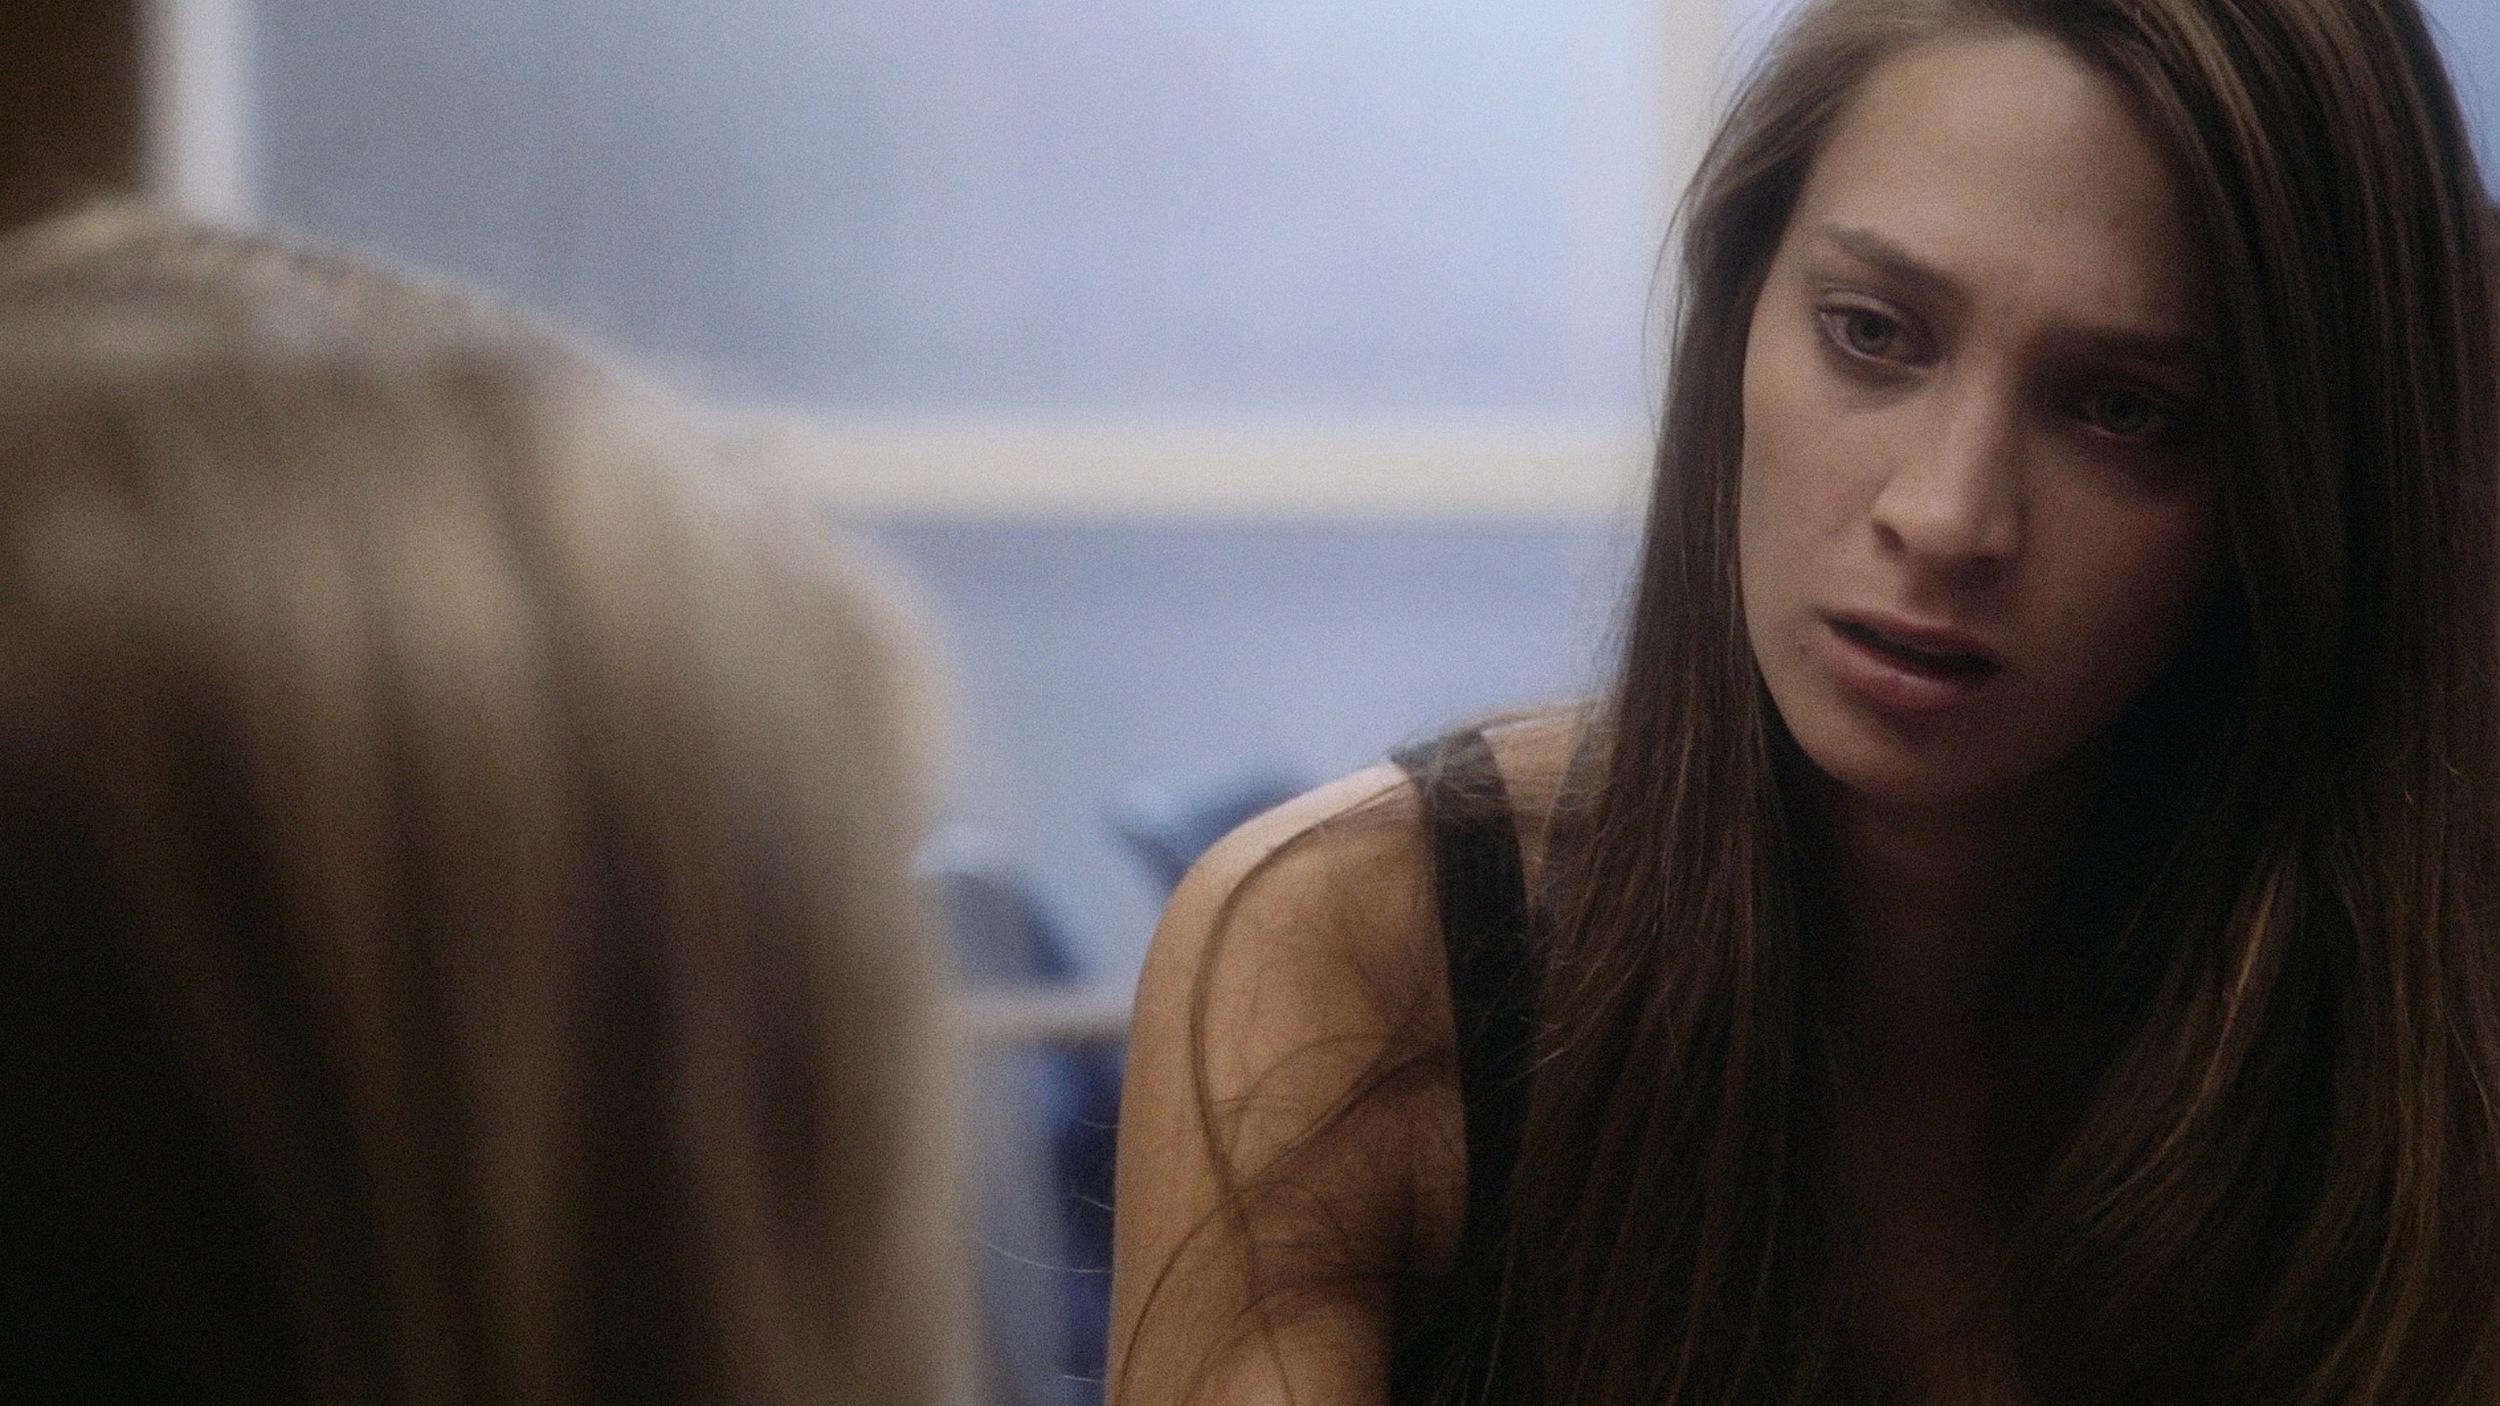 Sam (Stell Bahrami, right) reveals her secret to Emily (Jayna Sweet).